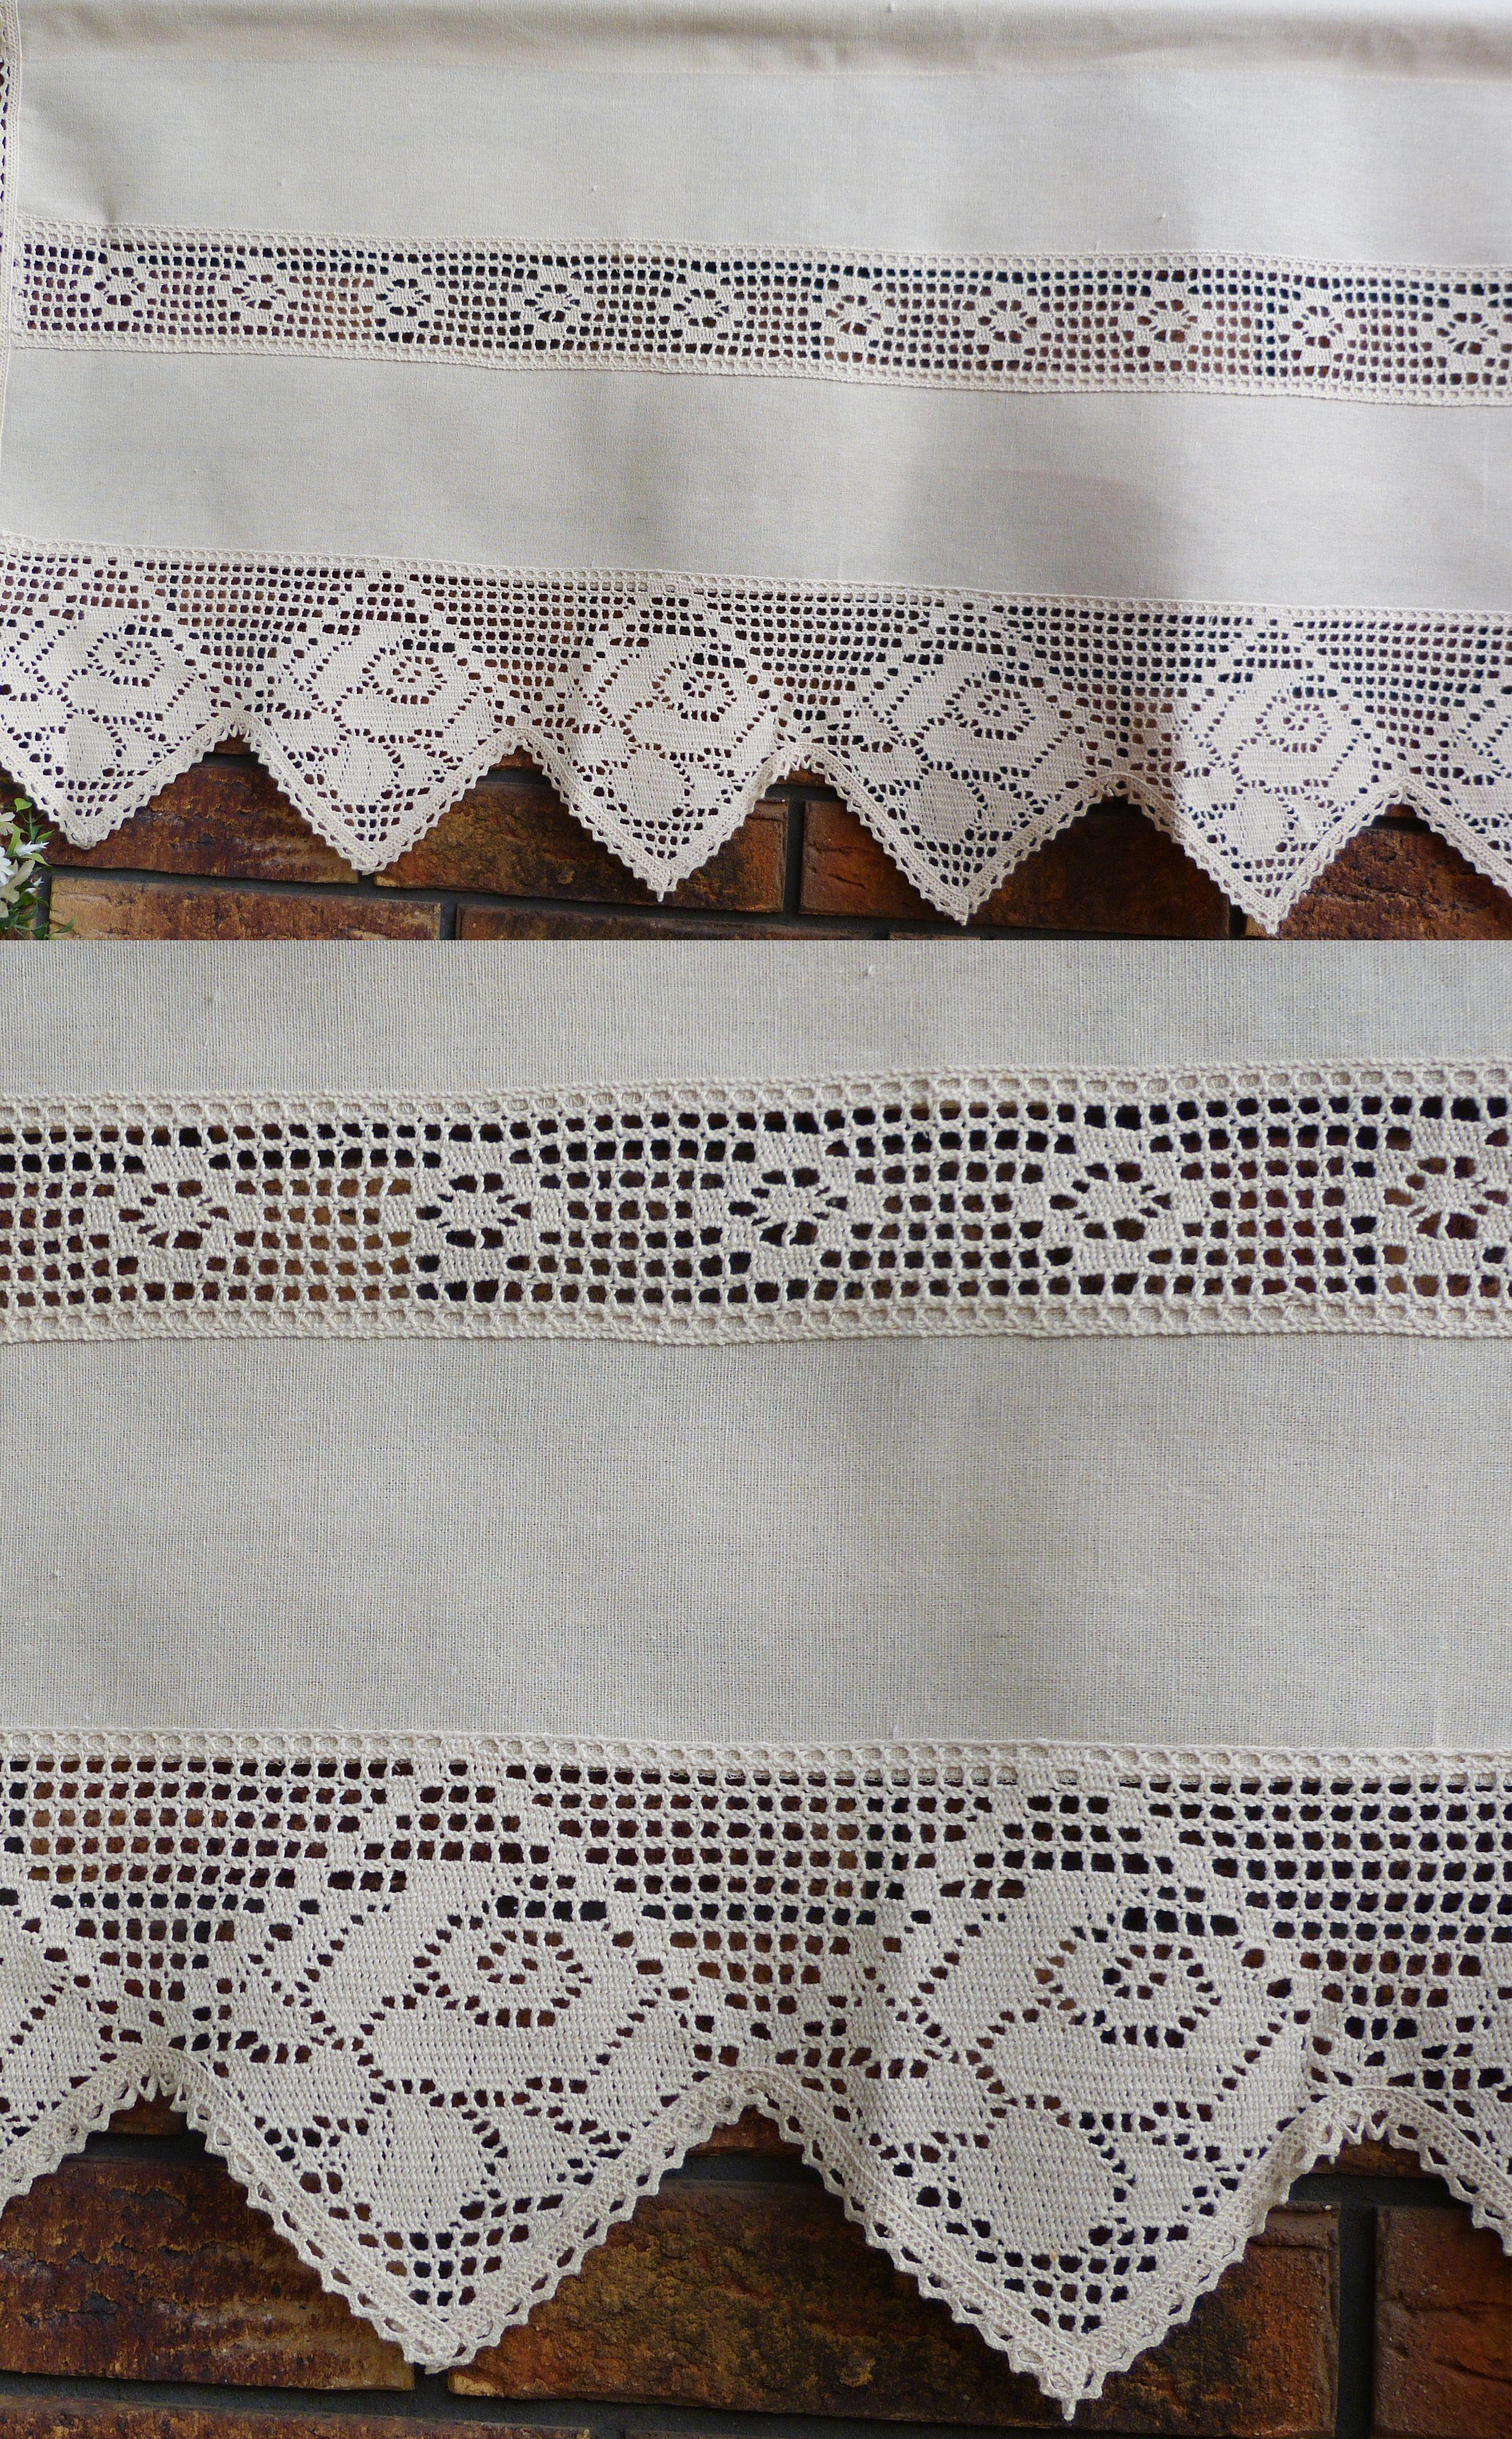 Babcina Zazdrostka Firana 200x50 Bez Koronka Okno 7451891701 Oficjalne Archiwum Allegro Home Decor Decor Curtains